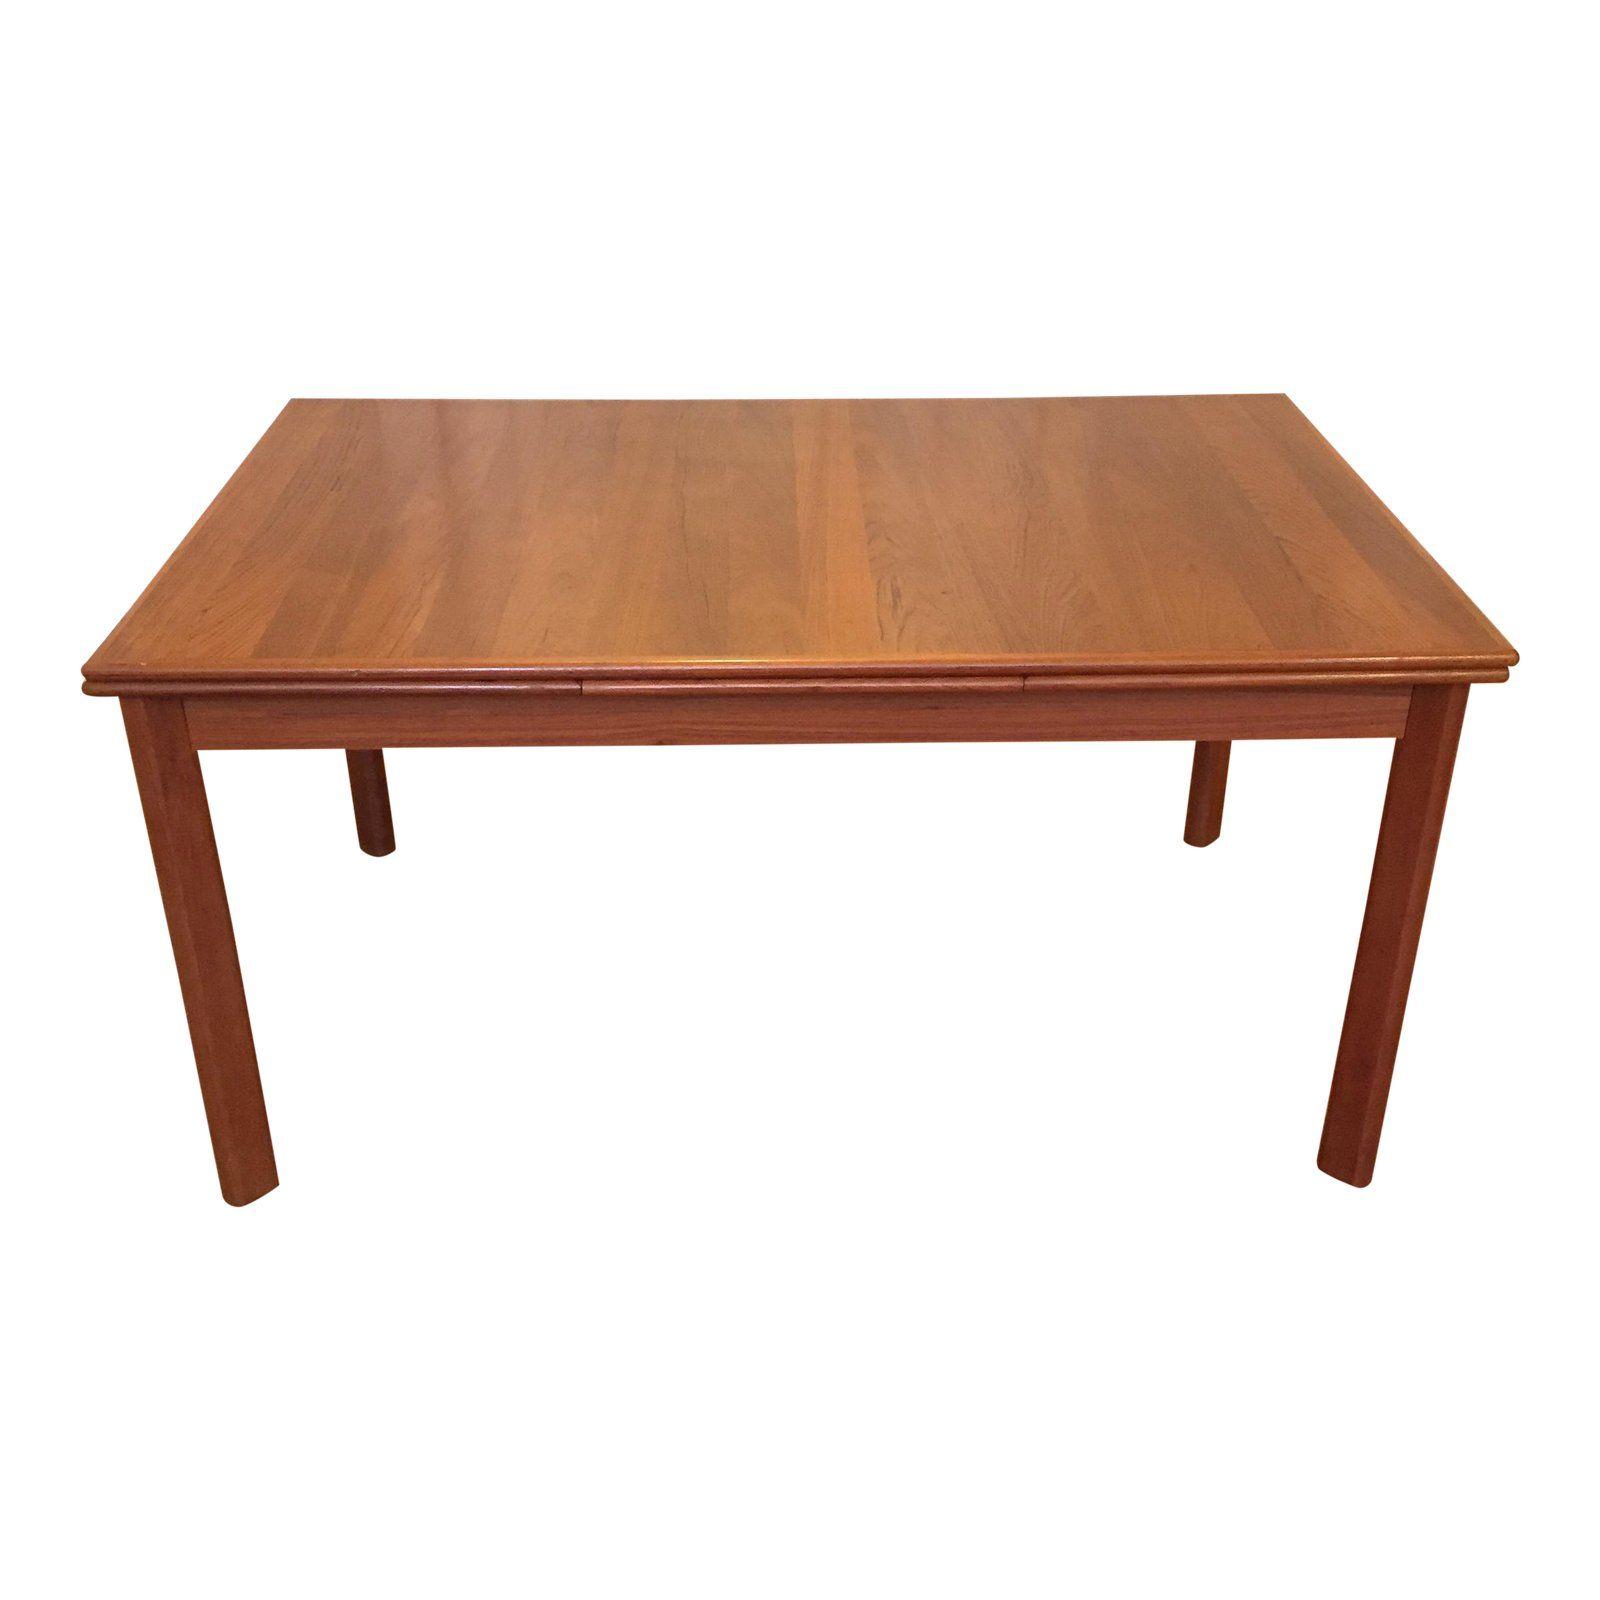 1960s Danish Modern Brdr Furbo Teak Dining Table Dining Table